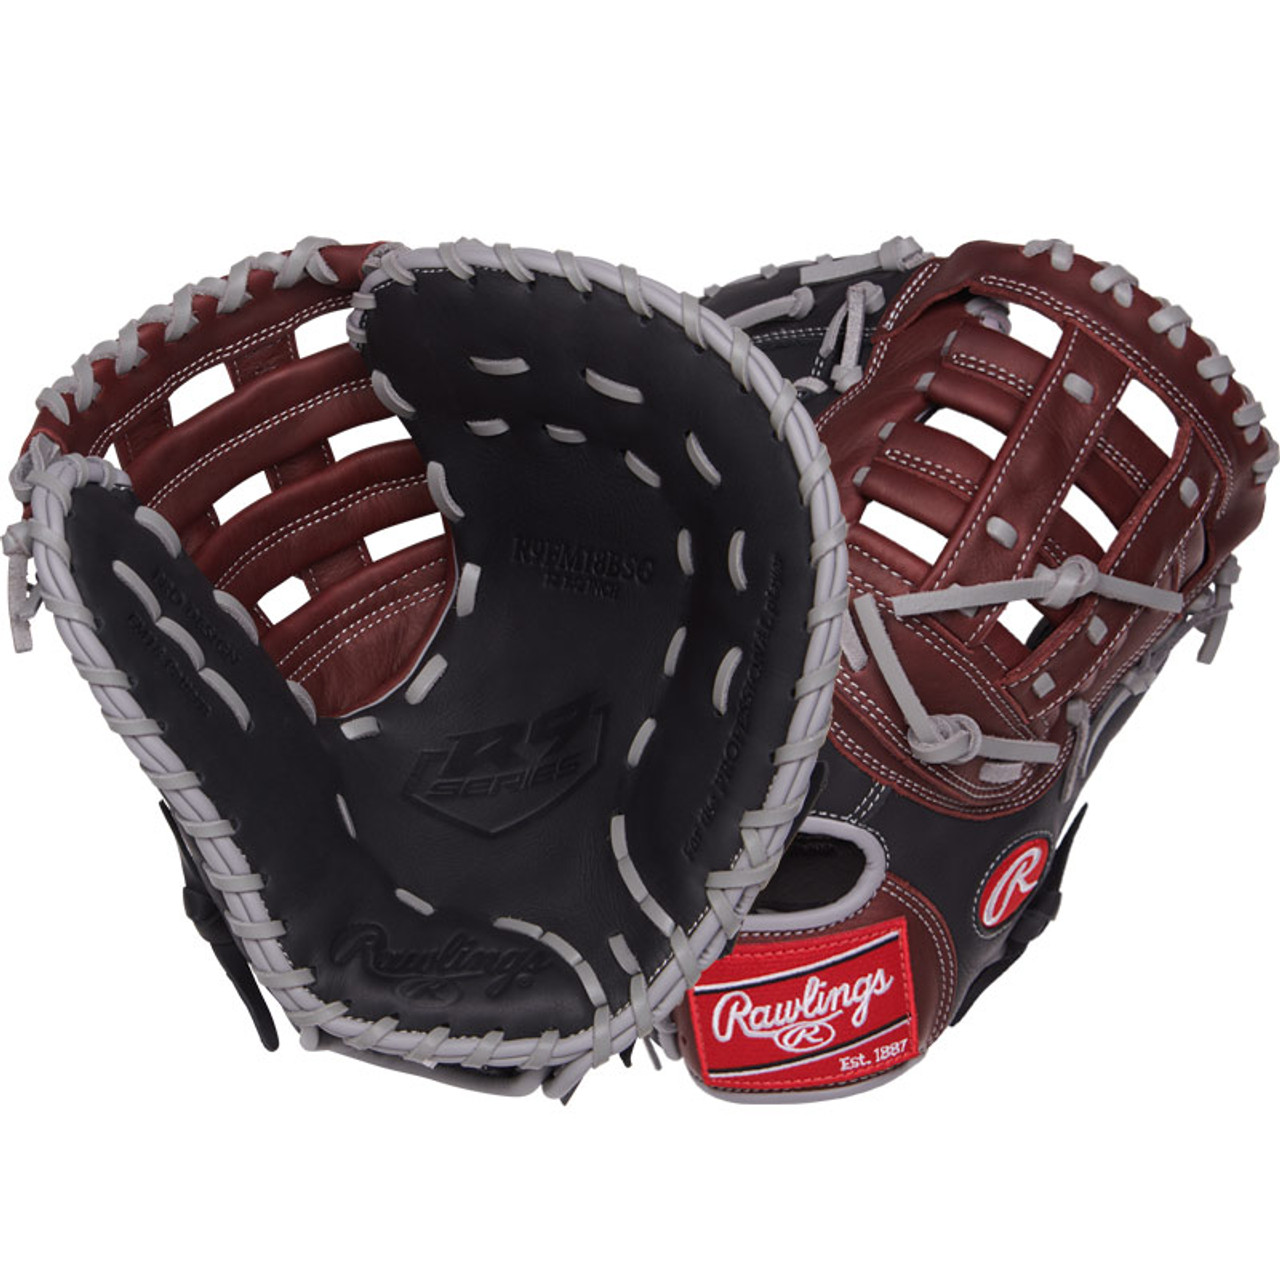 Rawlings R9 Youth Baseball Glove Series Right Hand Throw First Base Mitt